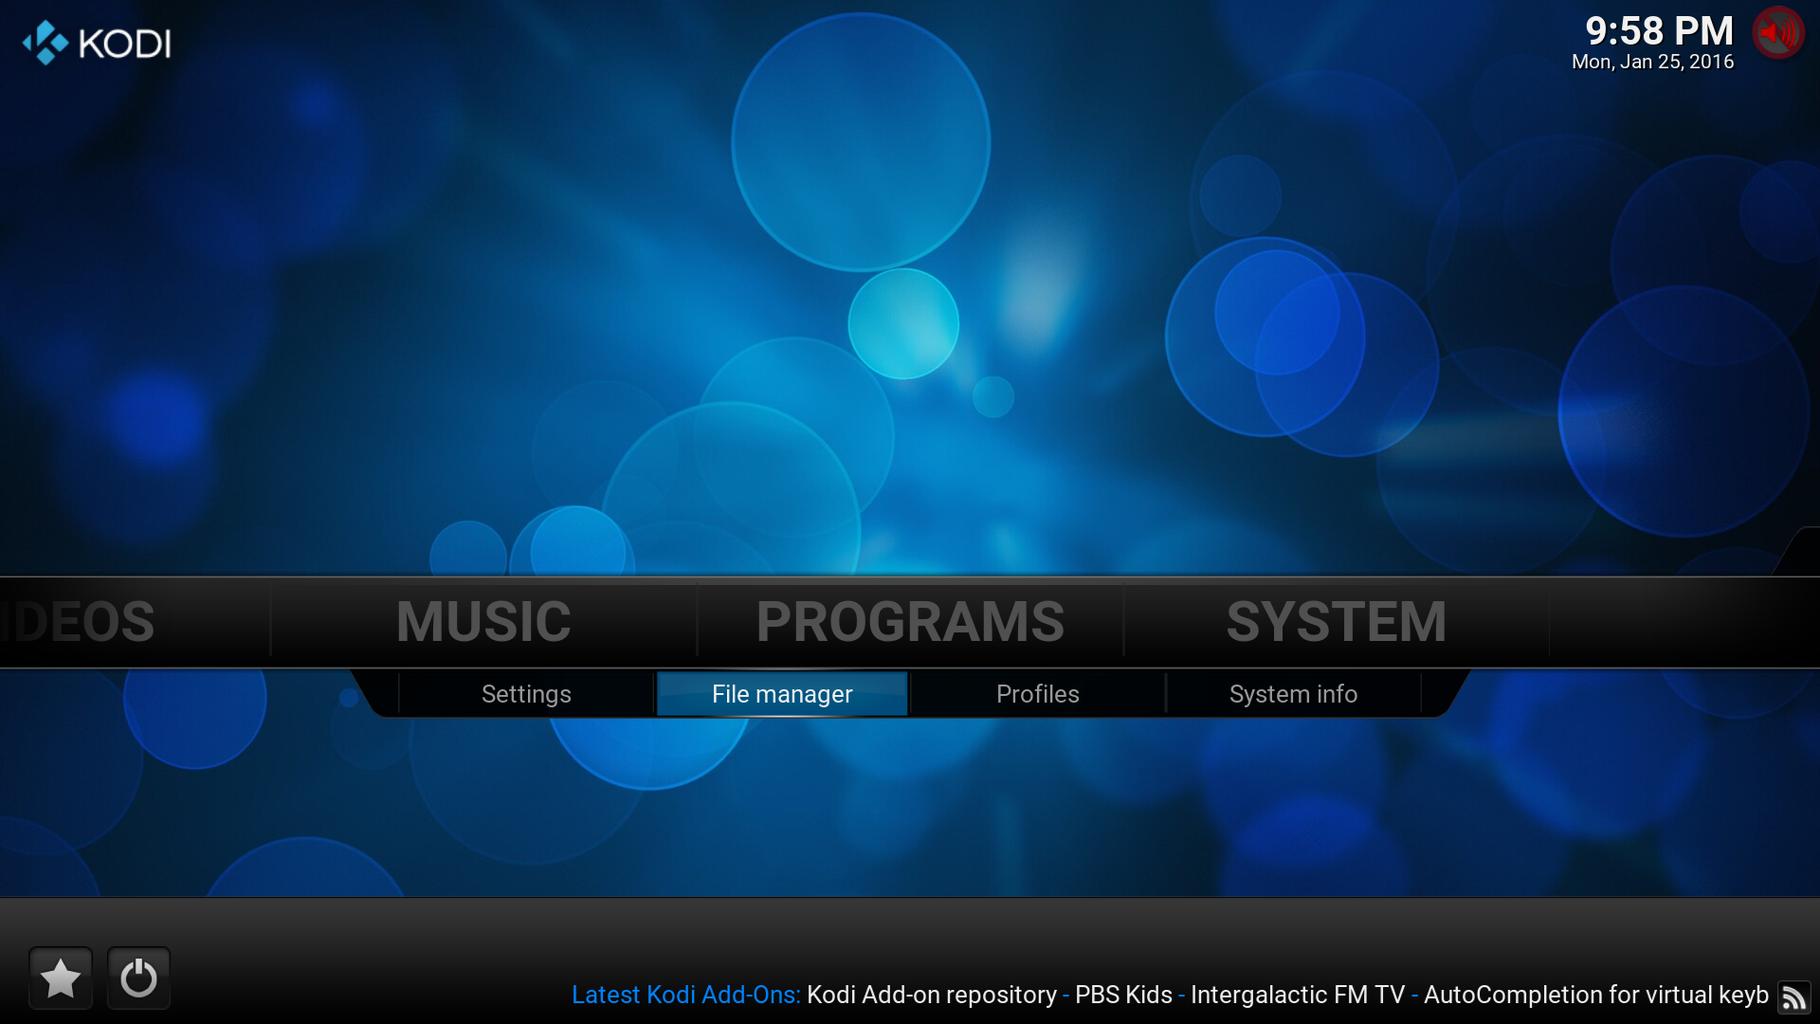 Download and Install Kodi